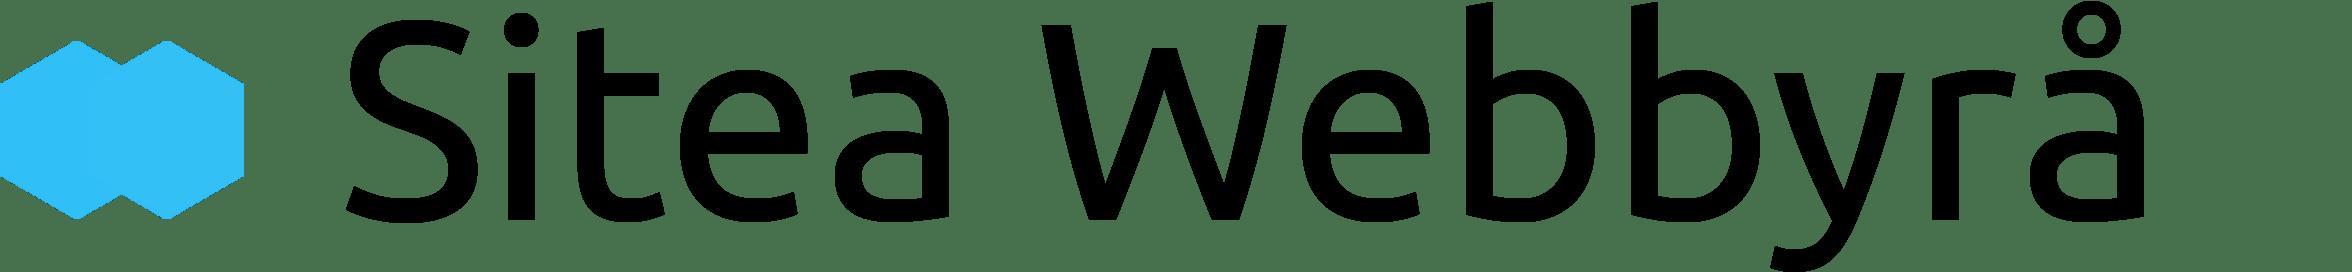 sitea webbyrå stockholm hemsida wordpress-min